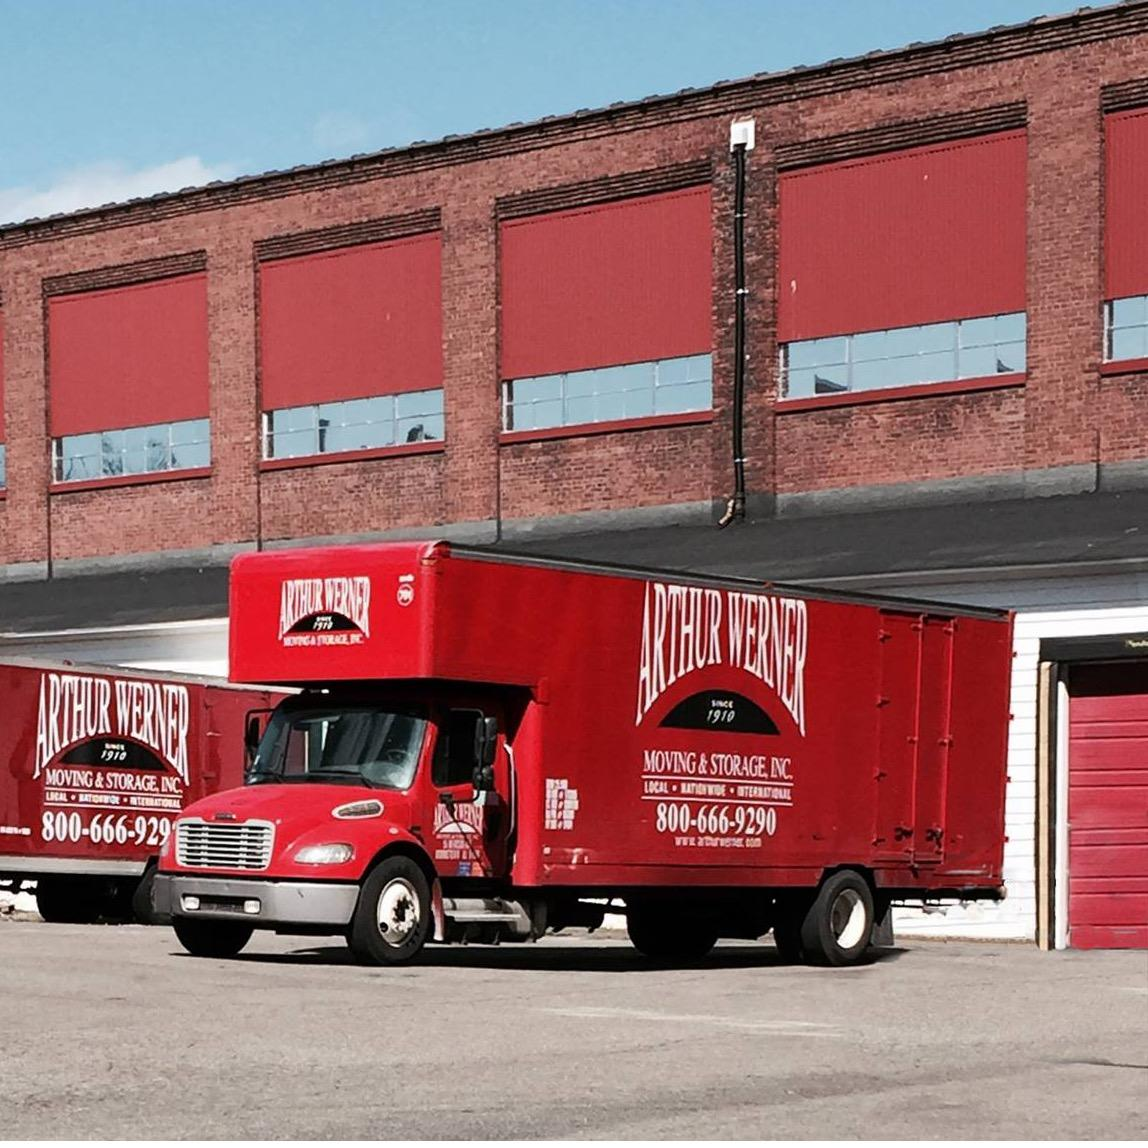 Arthur Werner Moving & Storage, Inc.